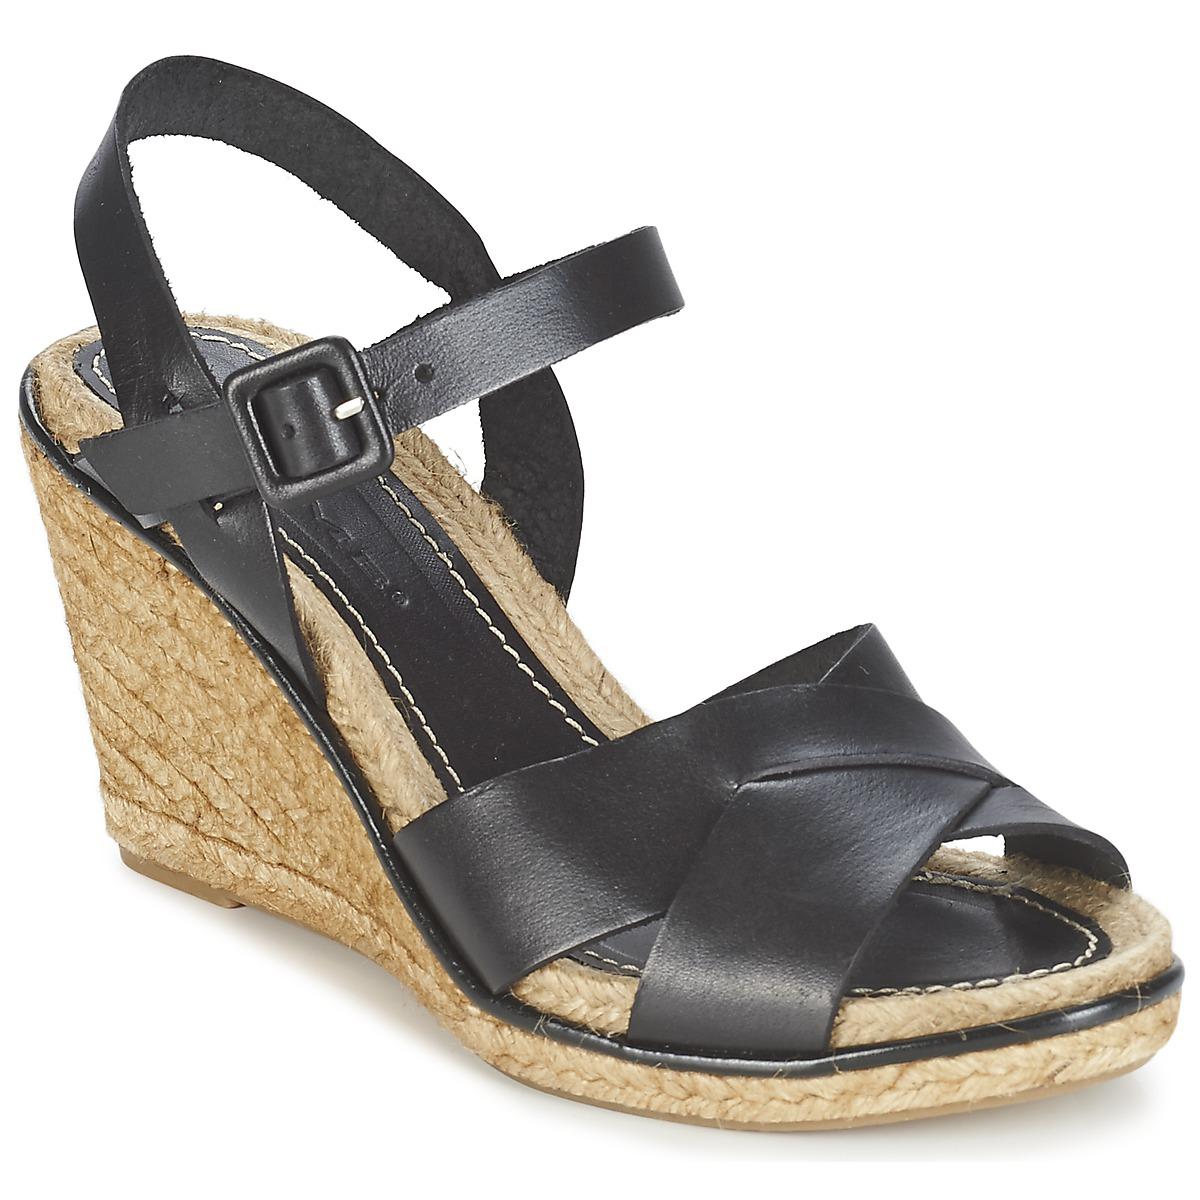 Sandale Nome Footwear ARISTOT Noir